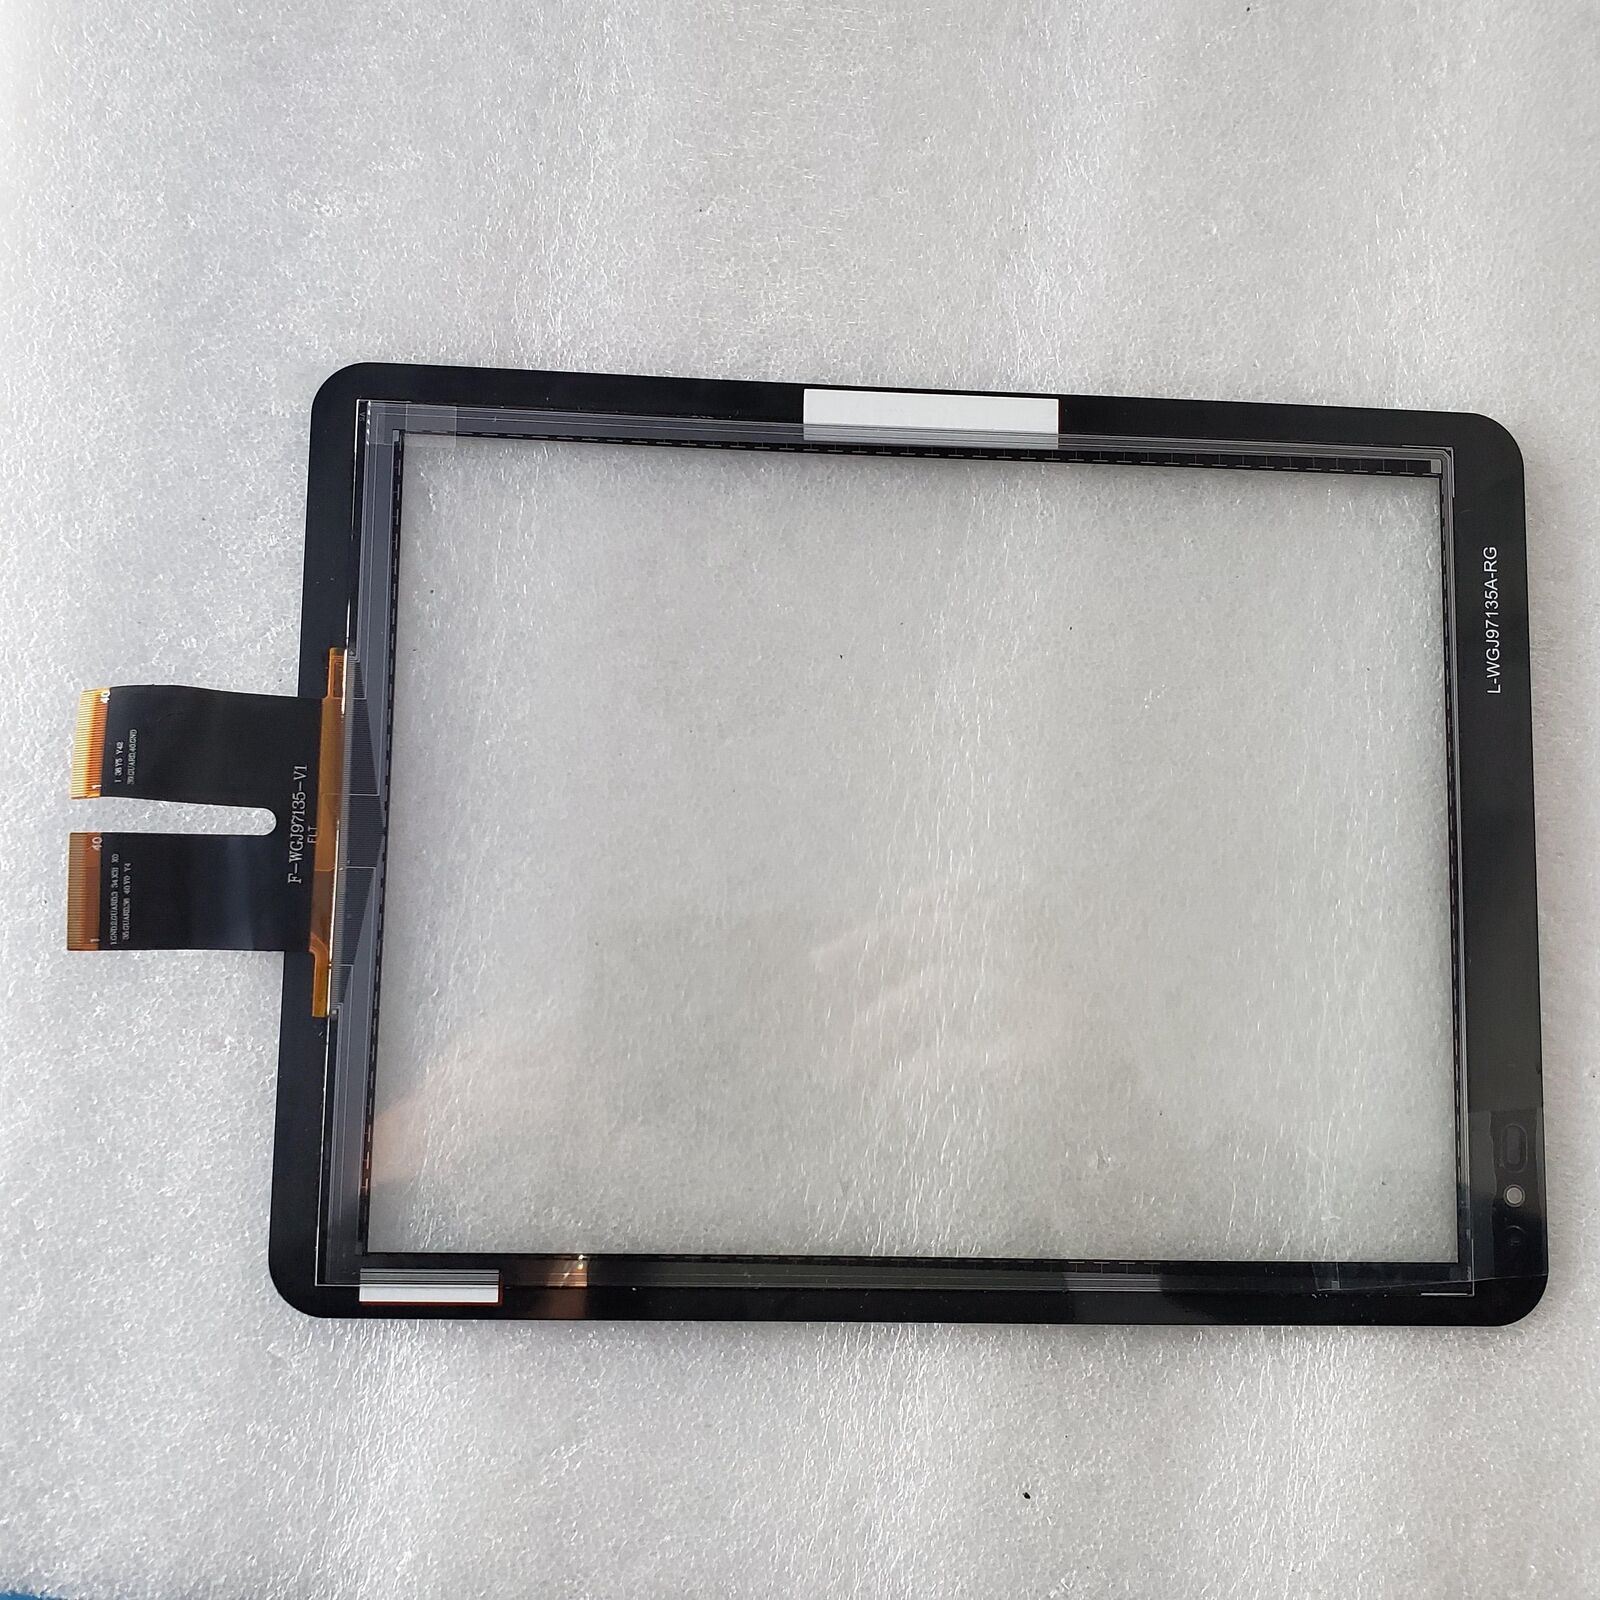 For P/N F-WGJ97135-V1 L-WGJ97135A-WHY 2 For Auto Scanner Touch Screen For Autel MaxiSys Elite